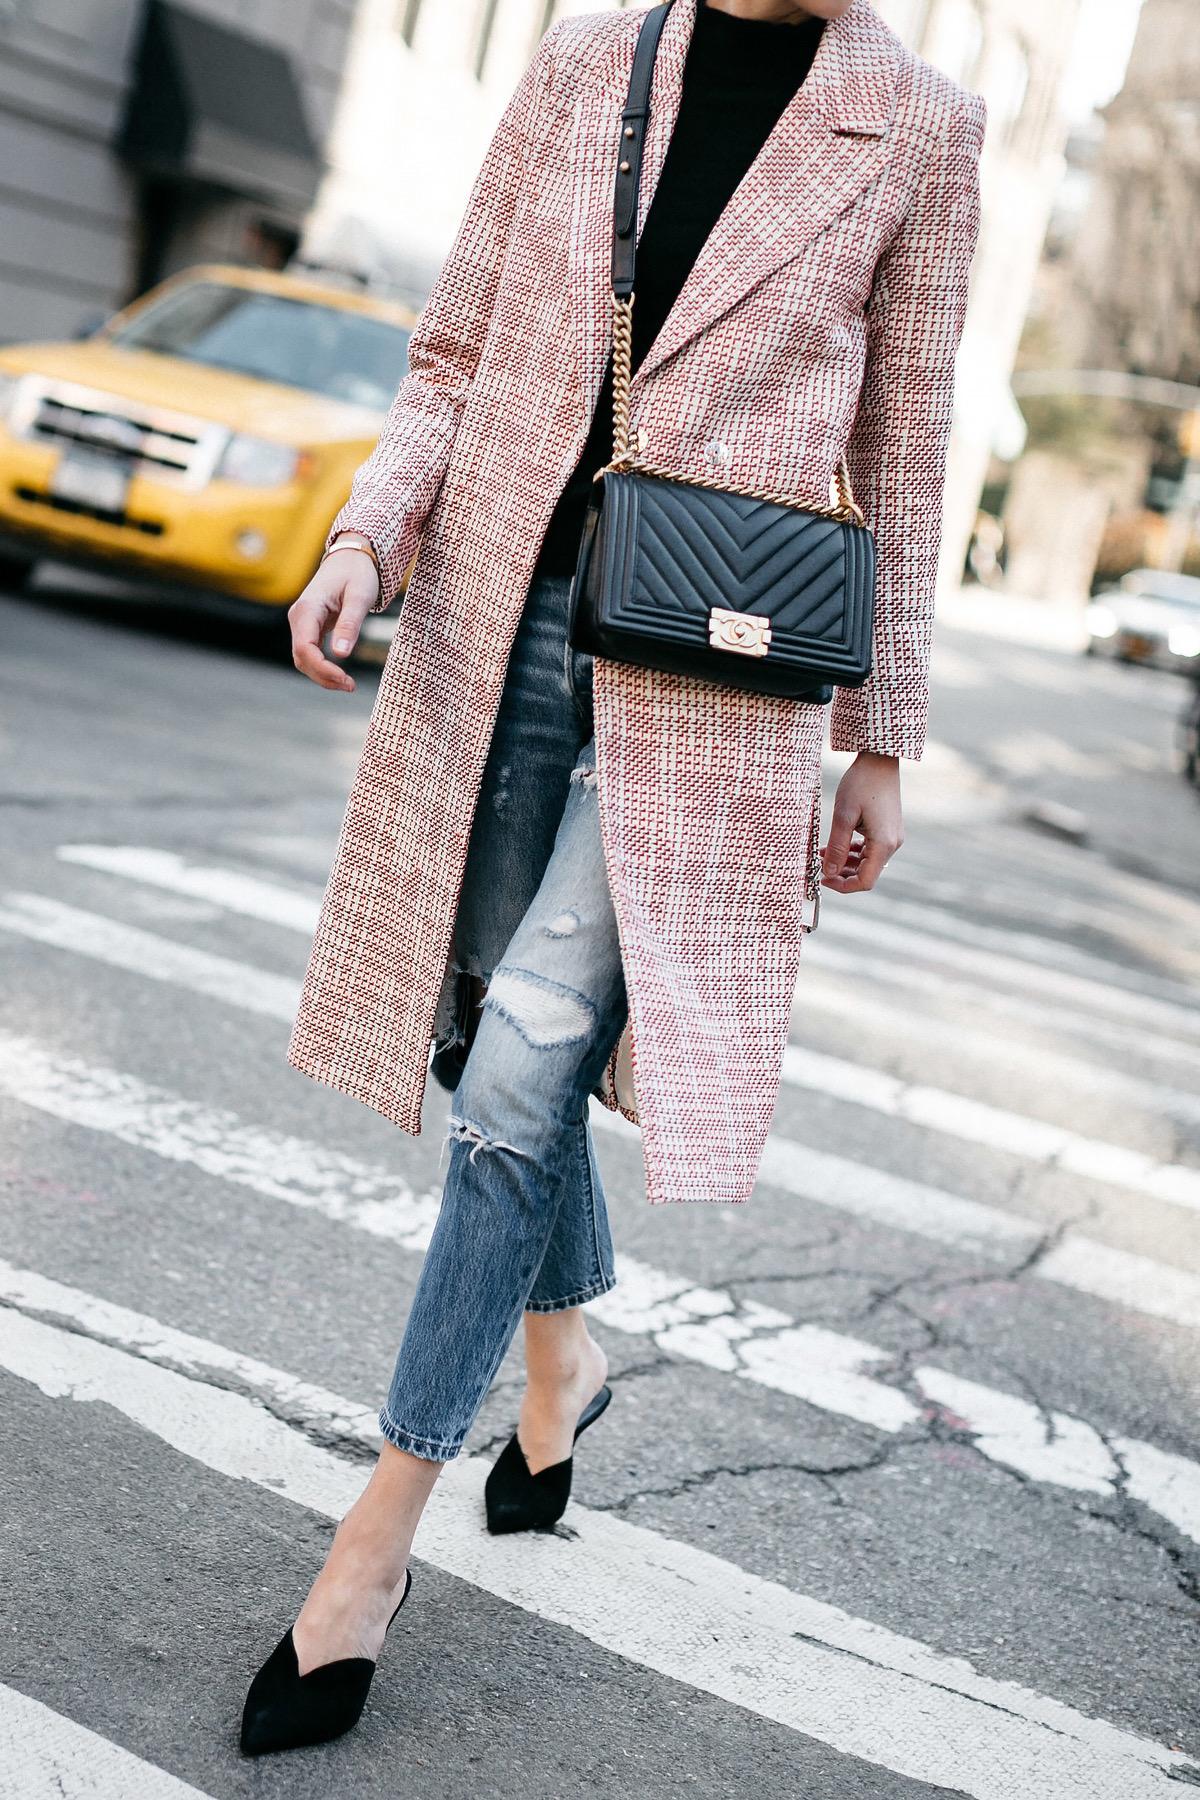 fashion-jackson-hm-tweed-coat-black-sweater-levis-ripped-jeans-black-pumps-chanel-black-chevron-boy-bag.jpg